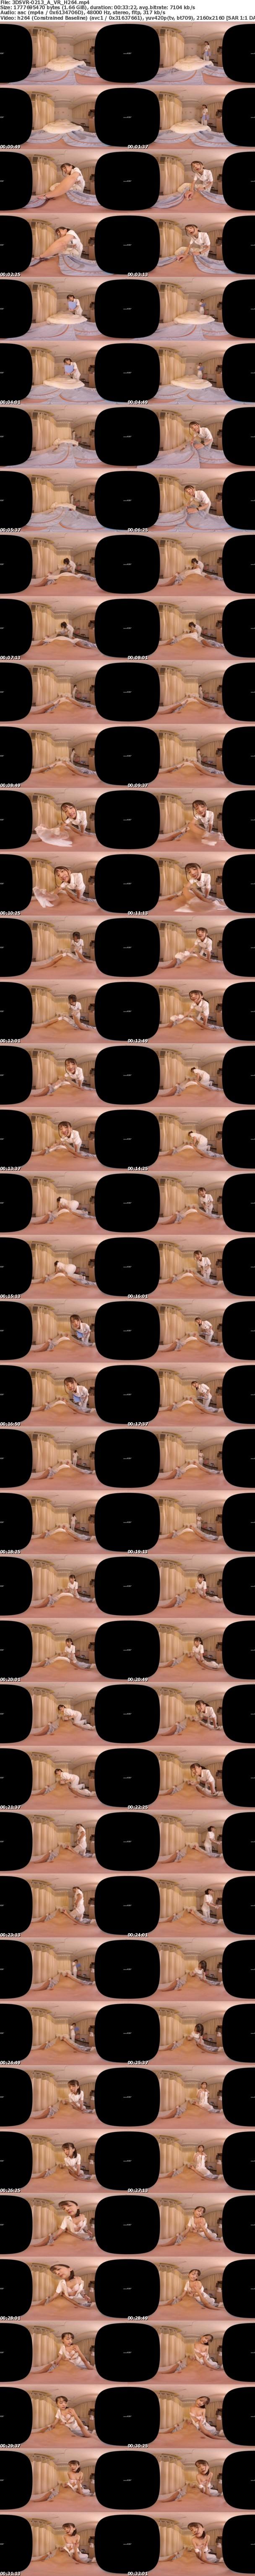 VR/3D 3DSVR-0213 清拭にきた新人ナースがめちゃくちゃ可愛い!こっそりセンズリを見せつけたら…